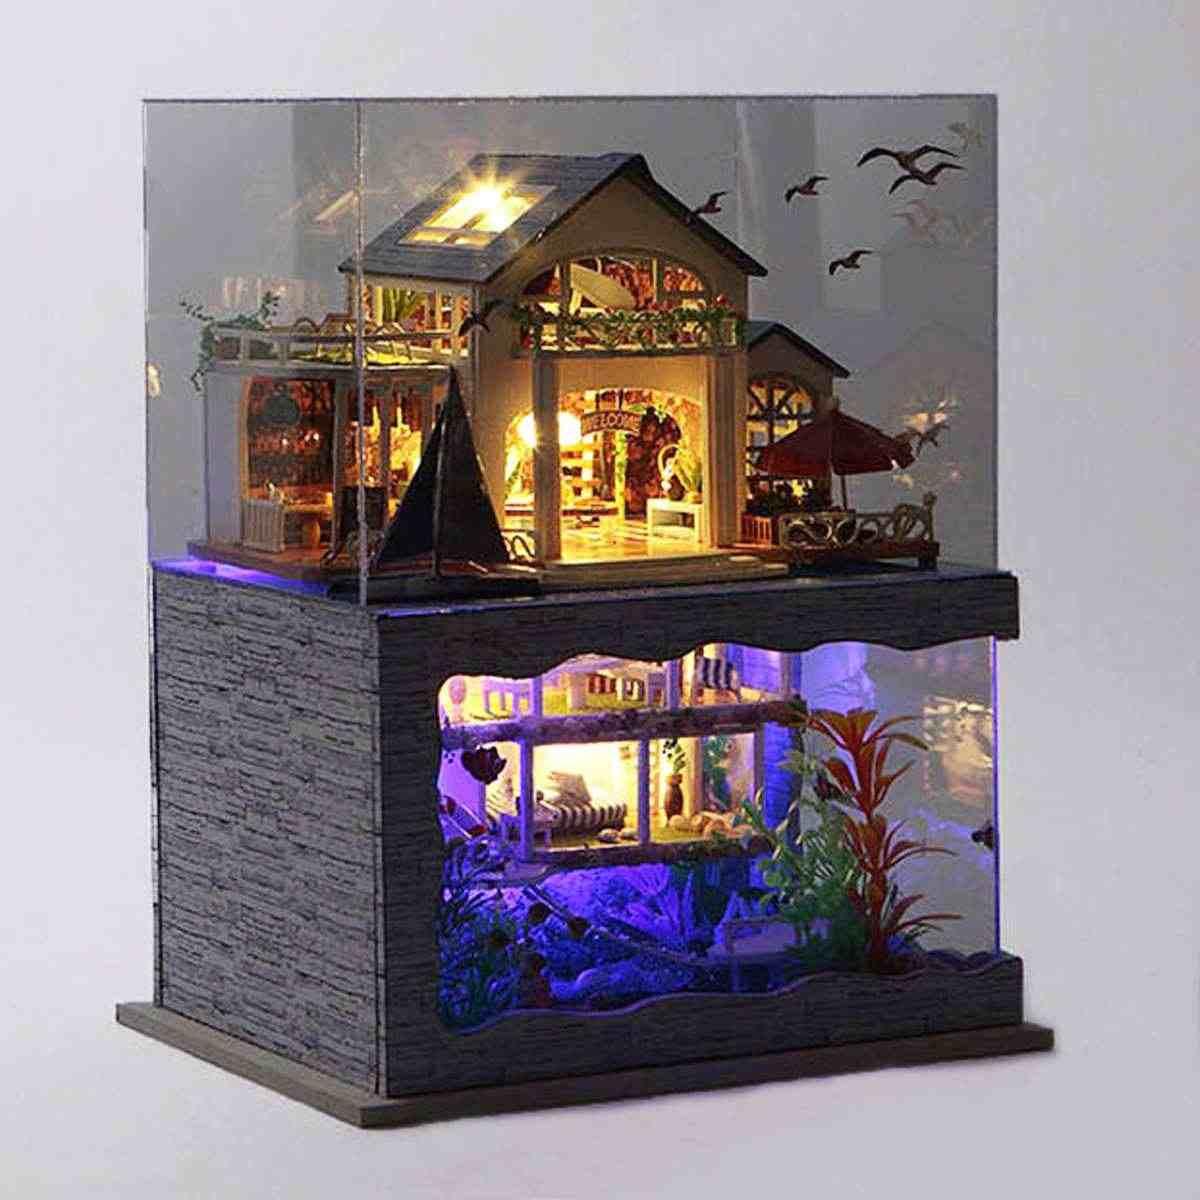 DIY Handmake Hawaii Villa Wooden Miniature Dollhouse Kit Creativing Birthday Christmas Gift Toy For Children Friends